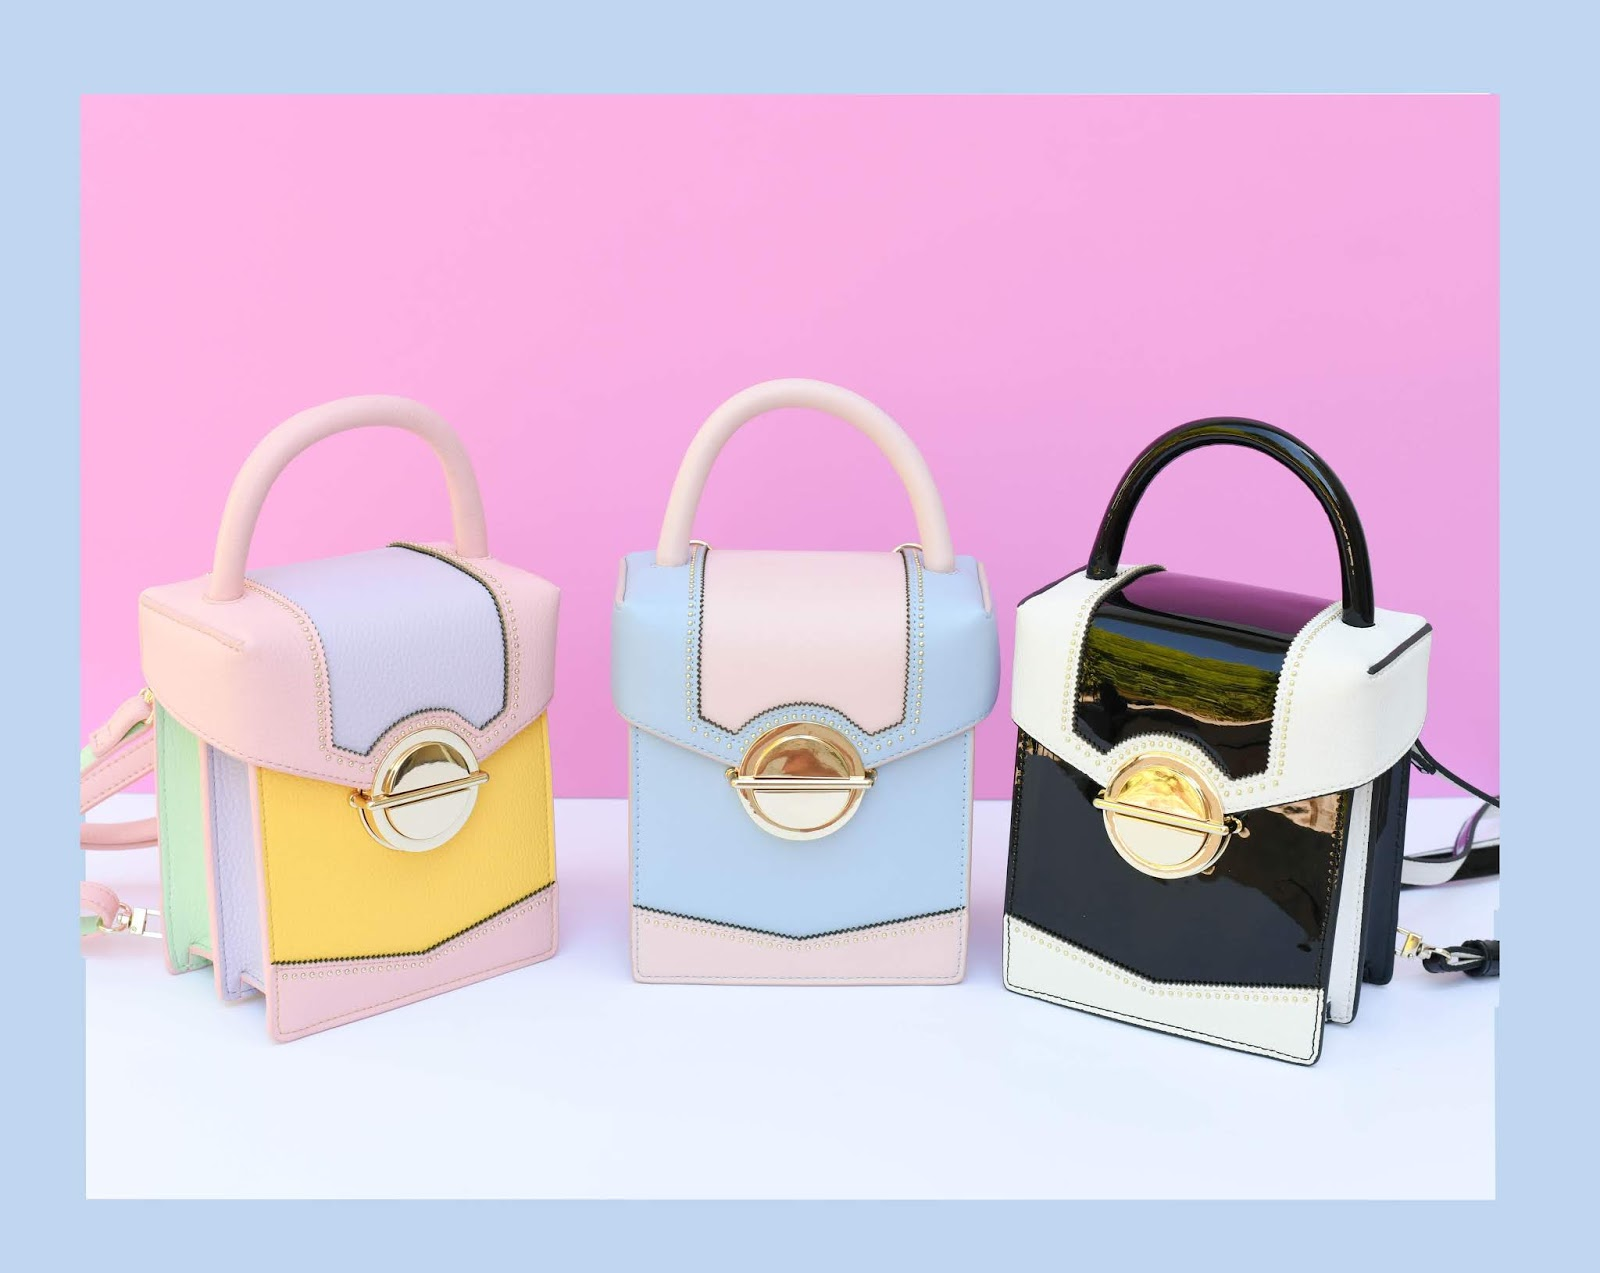 Studio 33 x A Fashion Nerd Vegan Mini Box Bags Launch